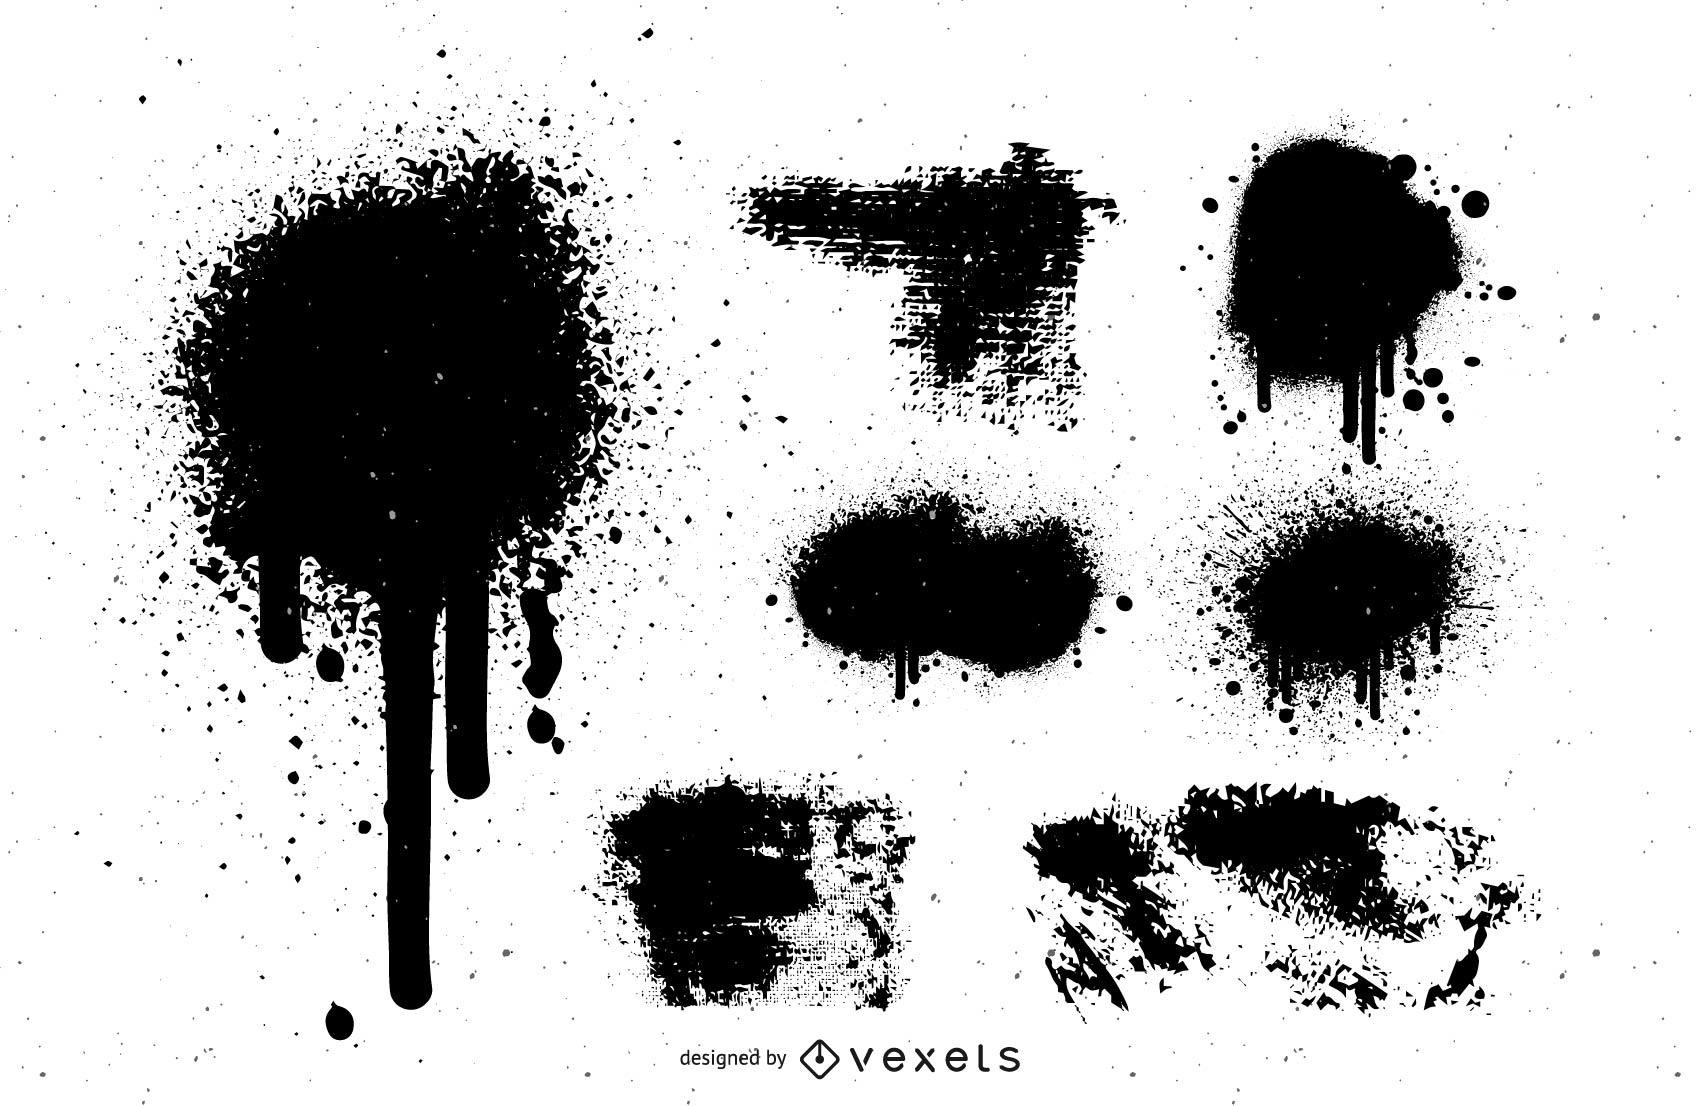 Conjunto de manchas negras grunge